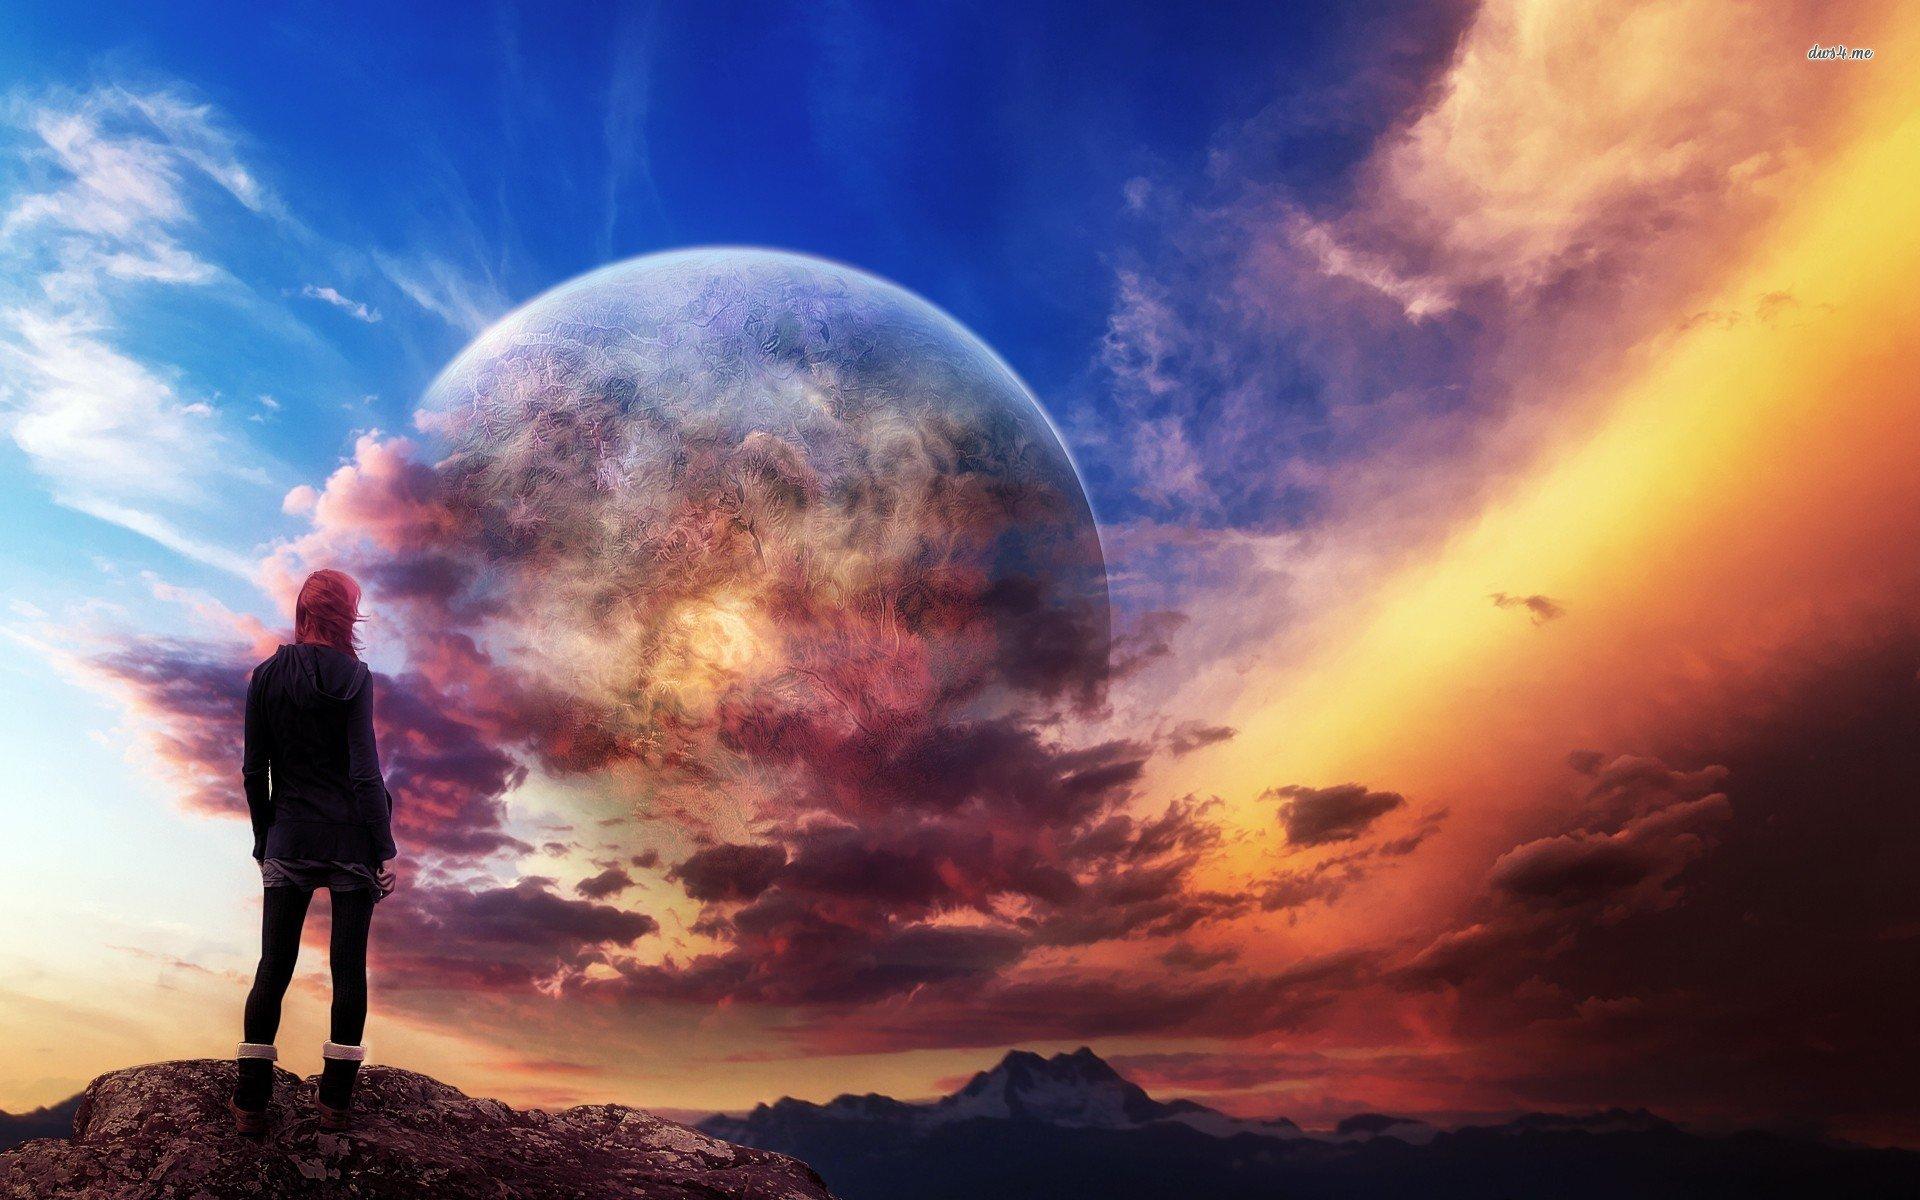 Dreamy planet wallpaper   Fantasy wallpapers   17903 1920x1200